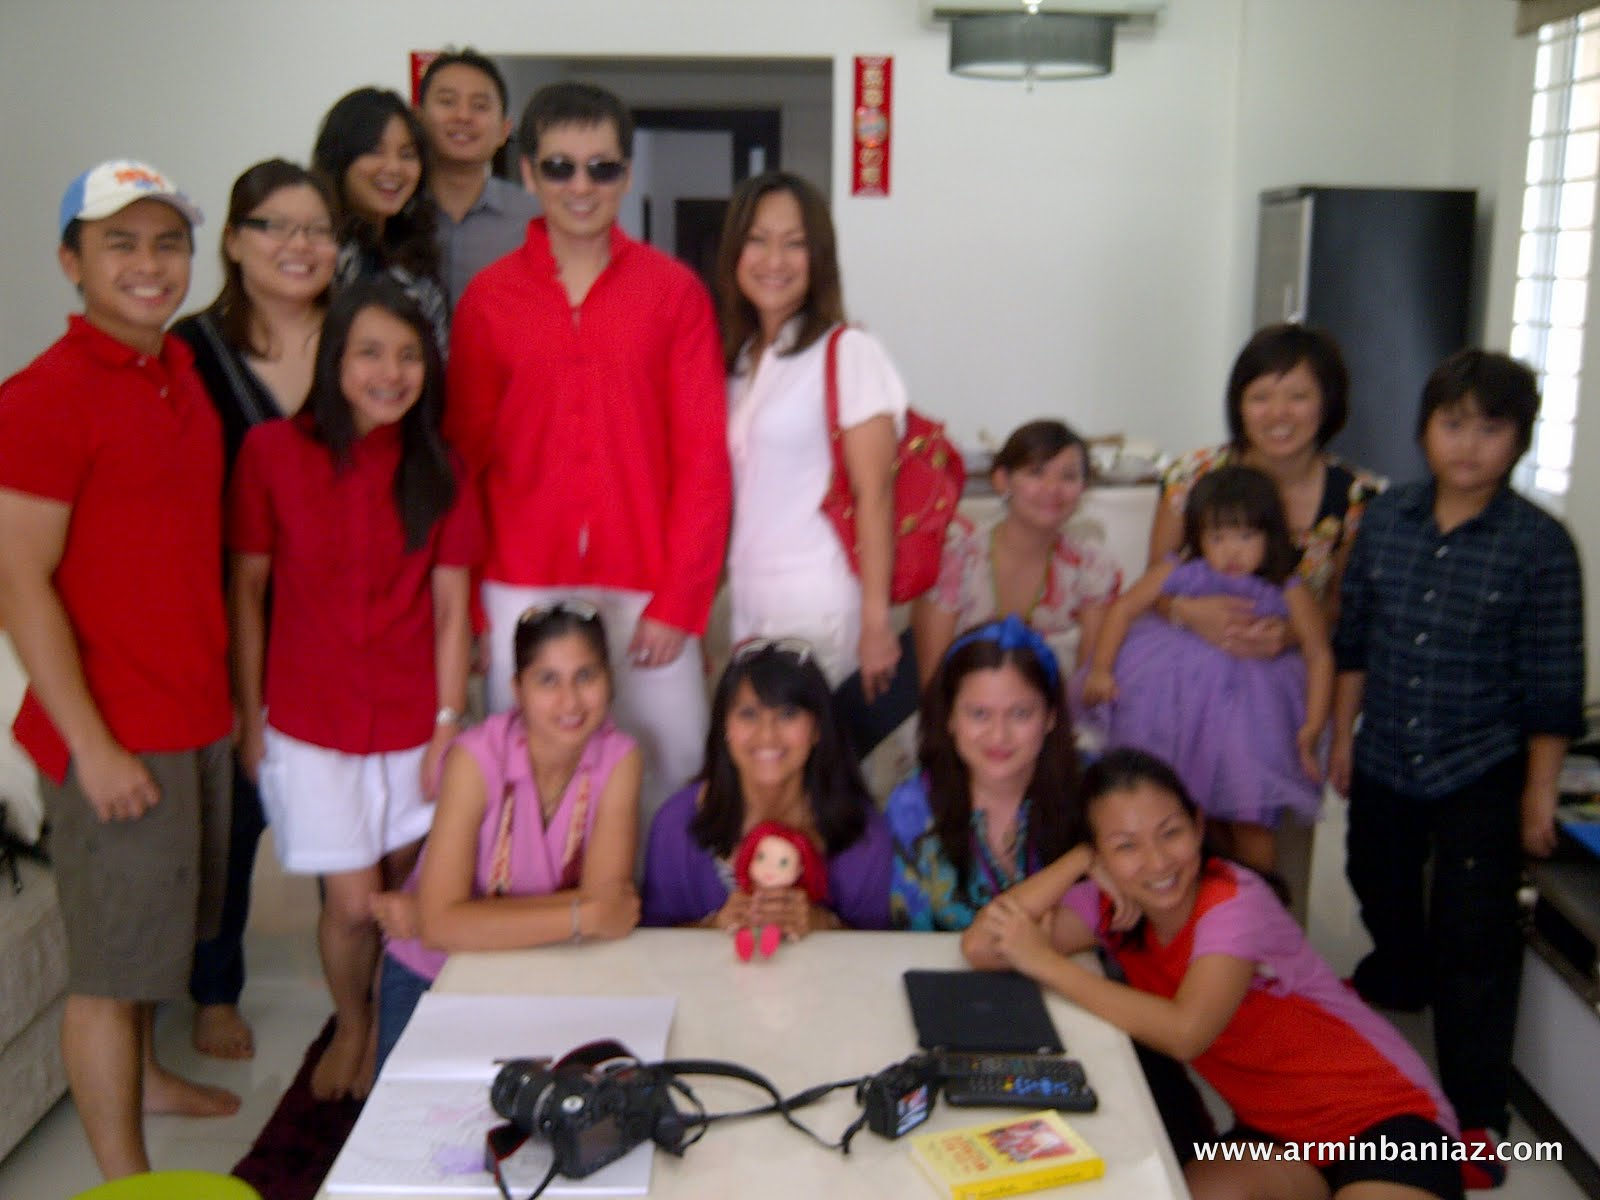 Gong Xi Fa Cai Pooi Ching Khiews Stay Tuned Lgs Slim Fit Youth Boy Giant Leap Merah M Daing Daniel Fitri Ody Nurfuadi Ruzalli Tng Yng Tan Shafad Syed Mahadzir Manshor